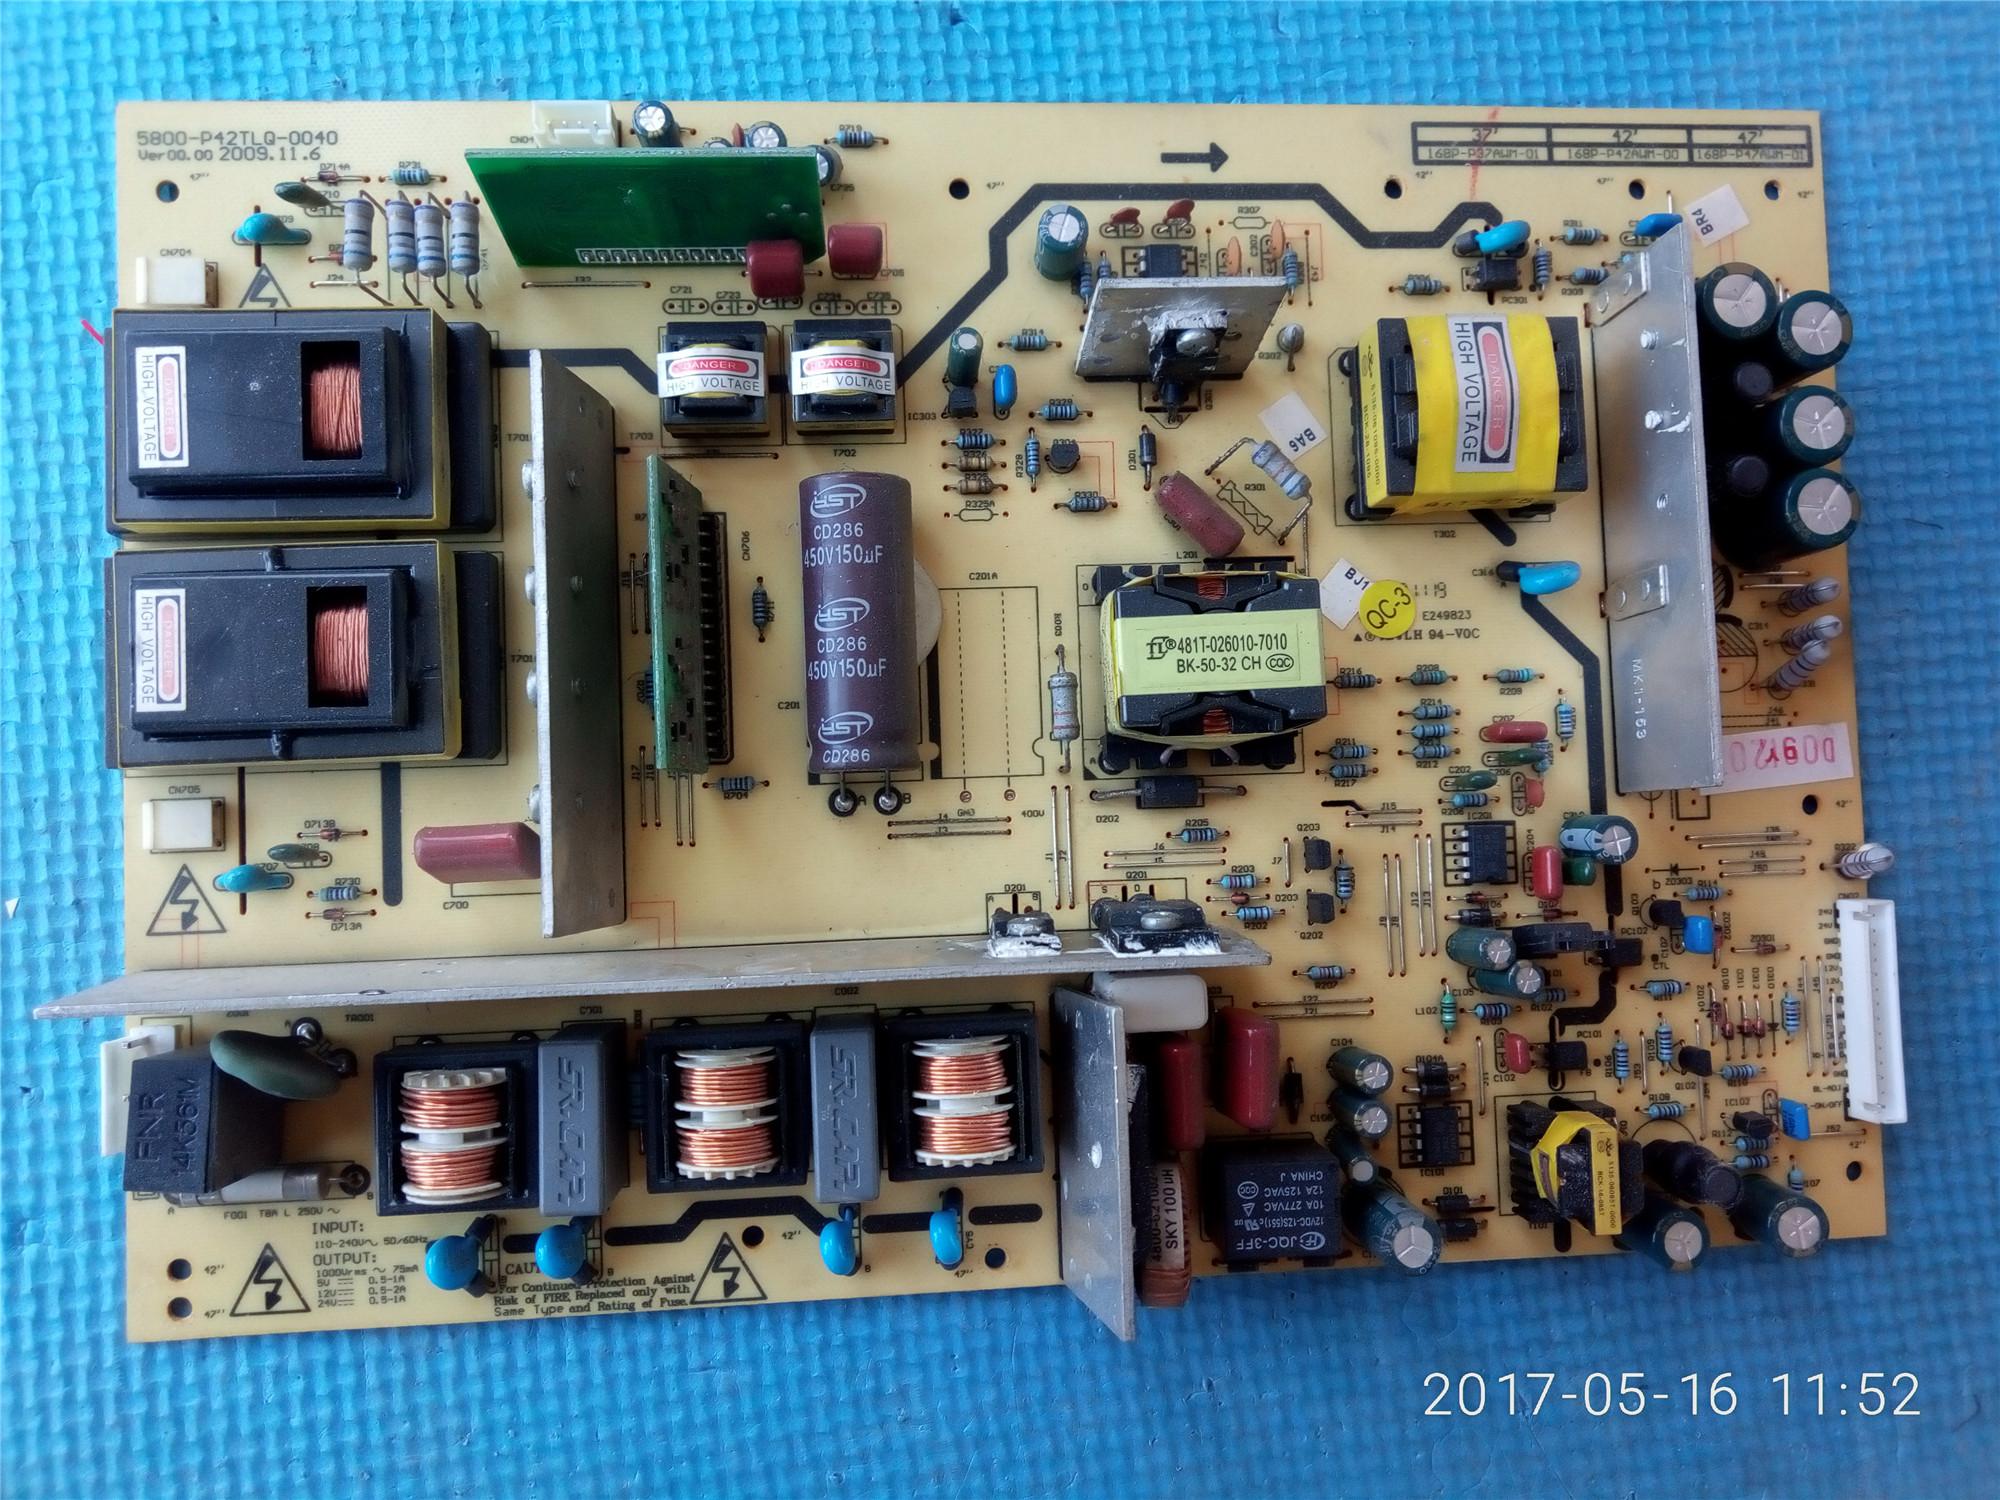 Skyworth 37L05HR/M11HM LCD - TV - Power Board 5800-P42TLQ-0040/0000 General